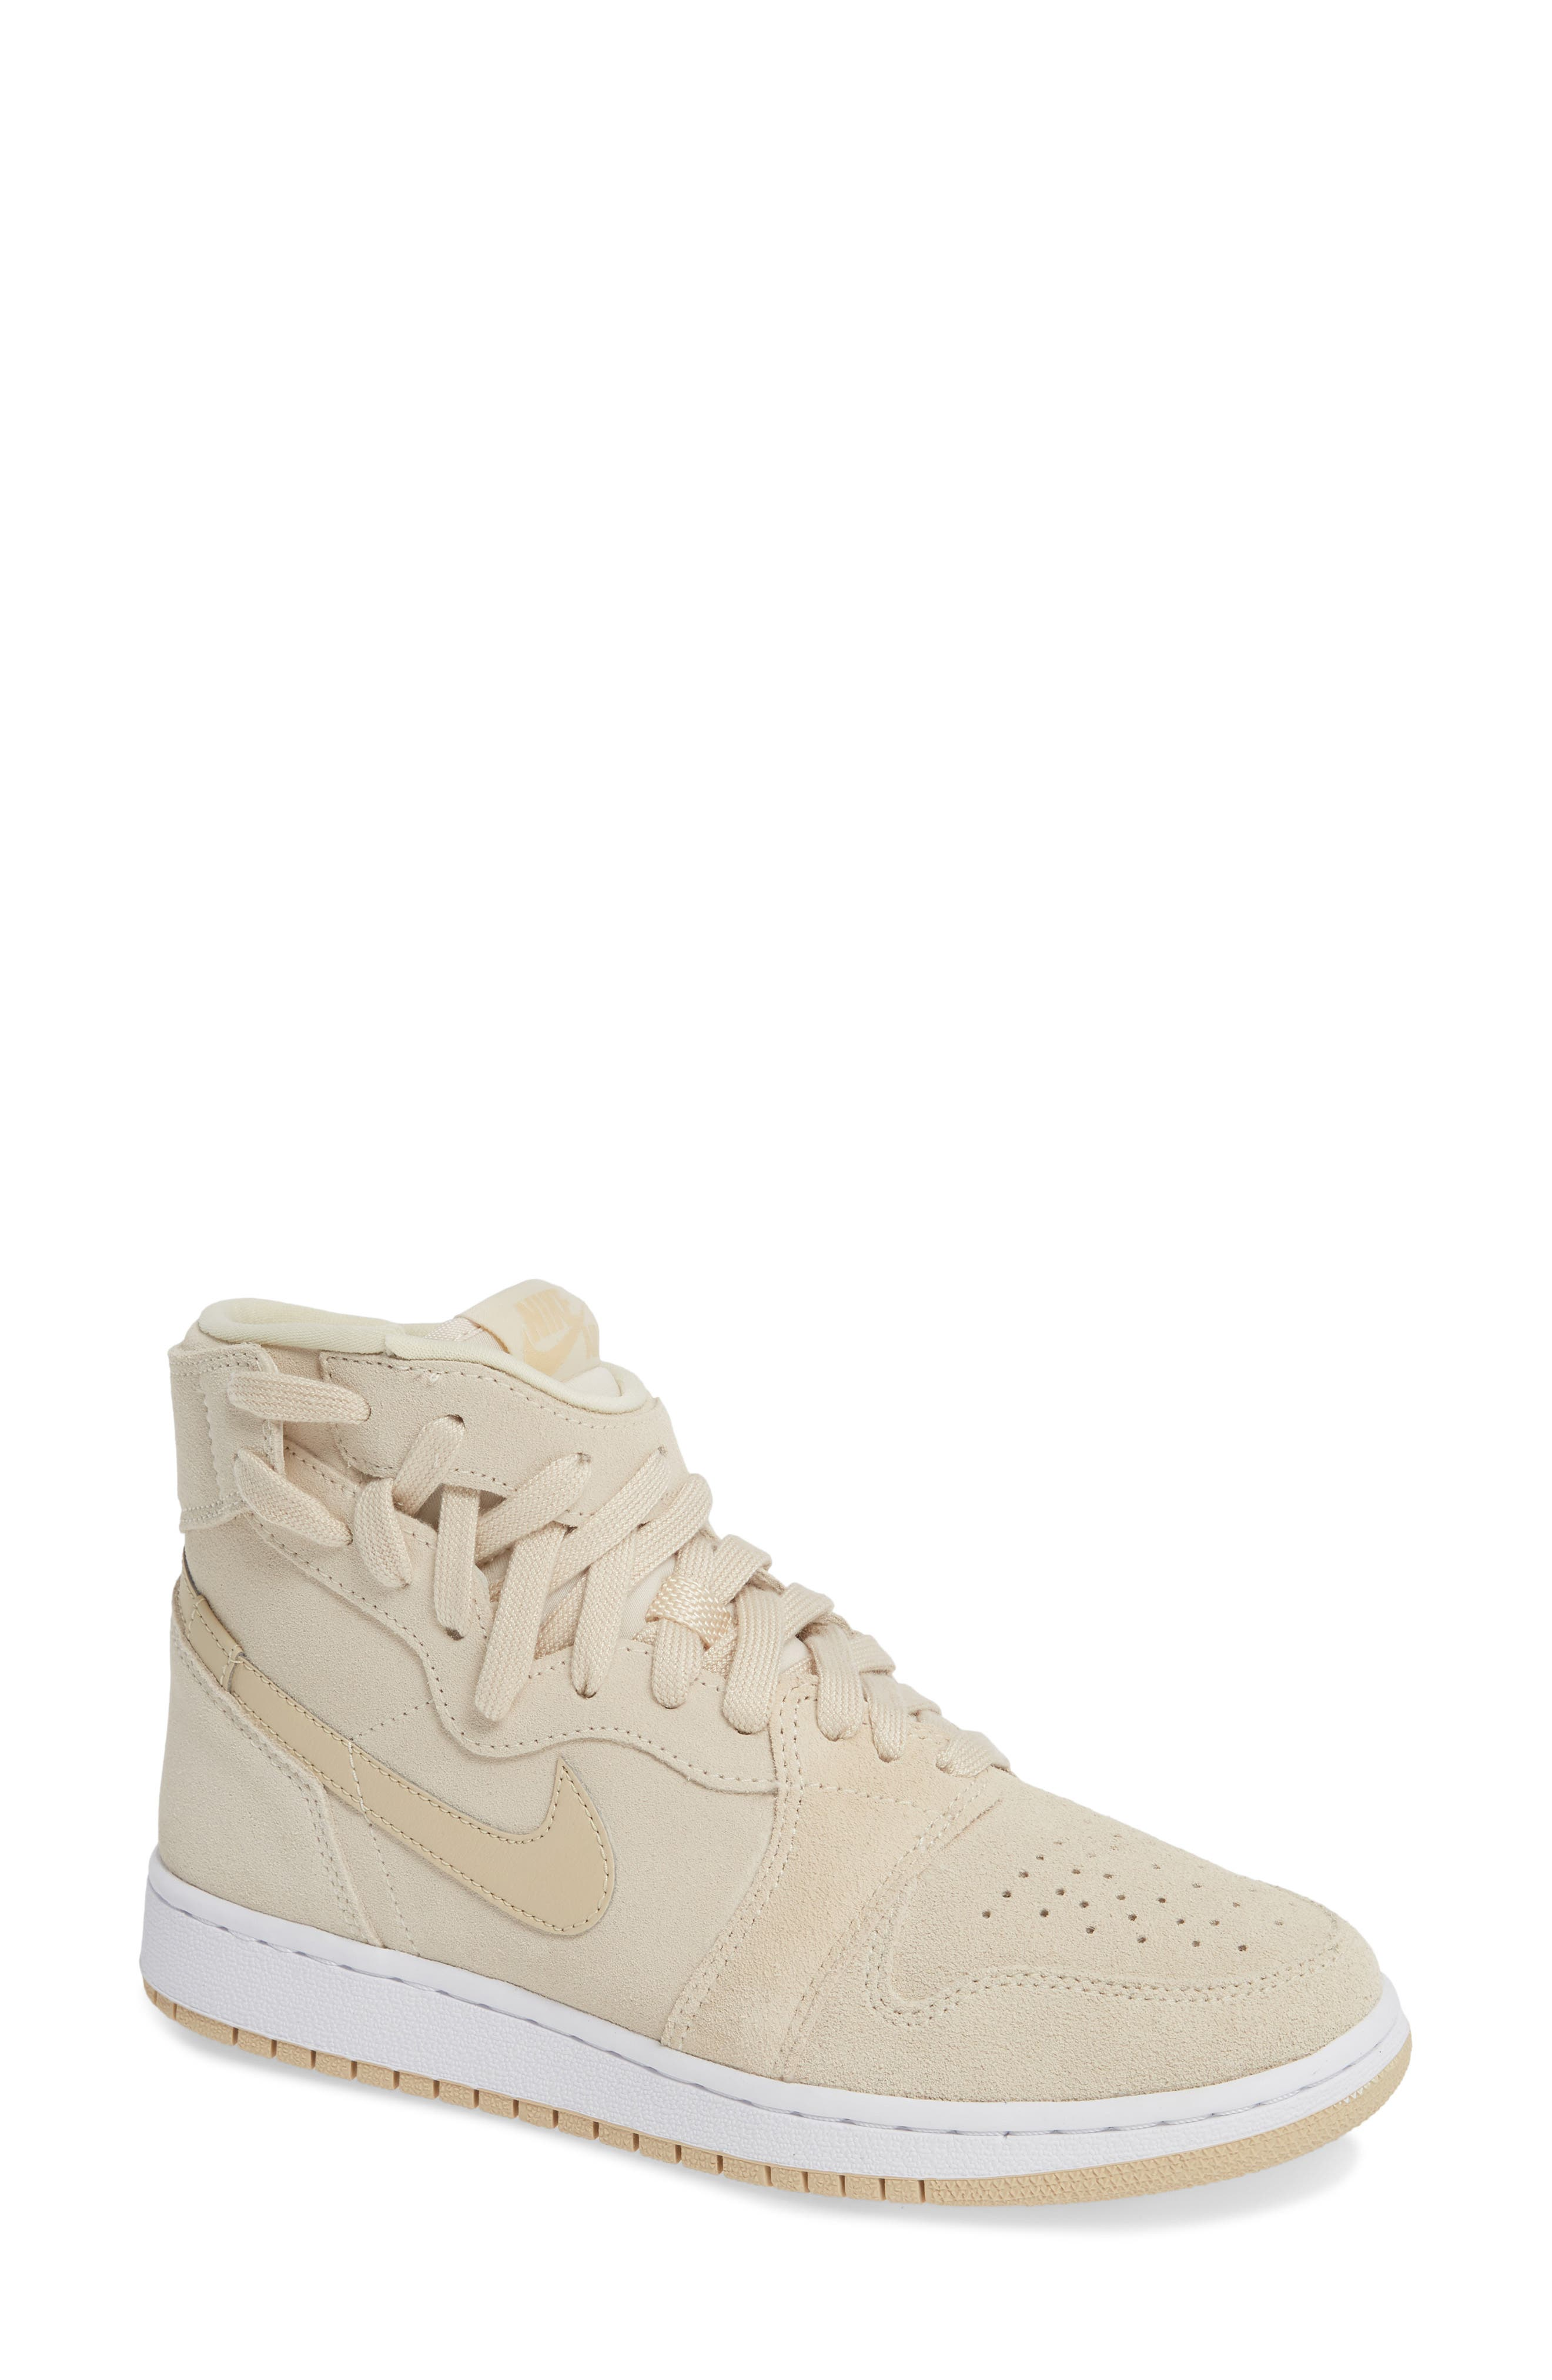 NIKE Air Jordan 1 Rebel XX High Top Sneaker, Main, color, LIGHT CREAM/ DESERT ORE/ WHITE